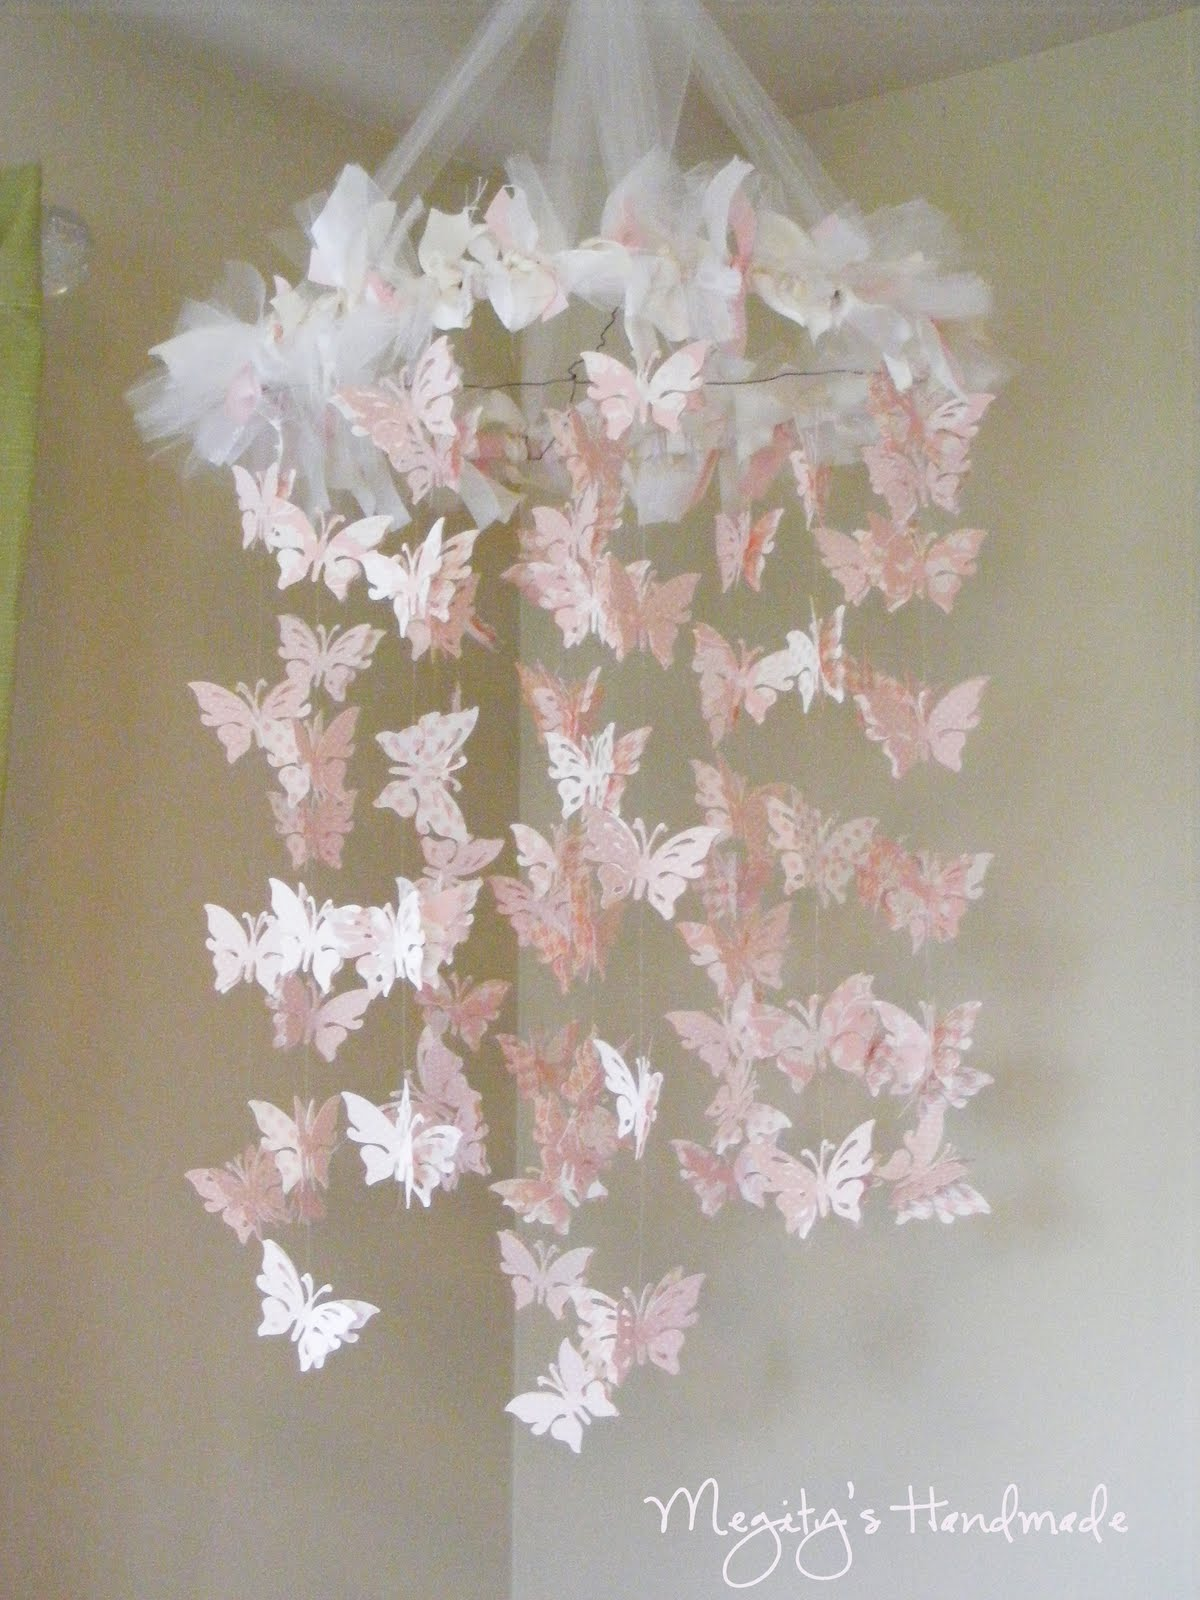 megity 39 s handmade butterfly chandelier mobile